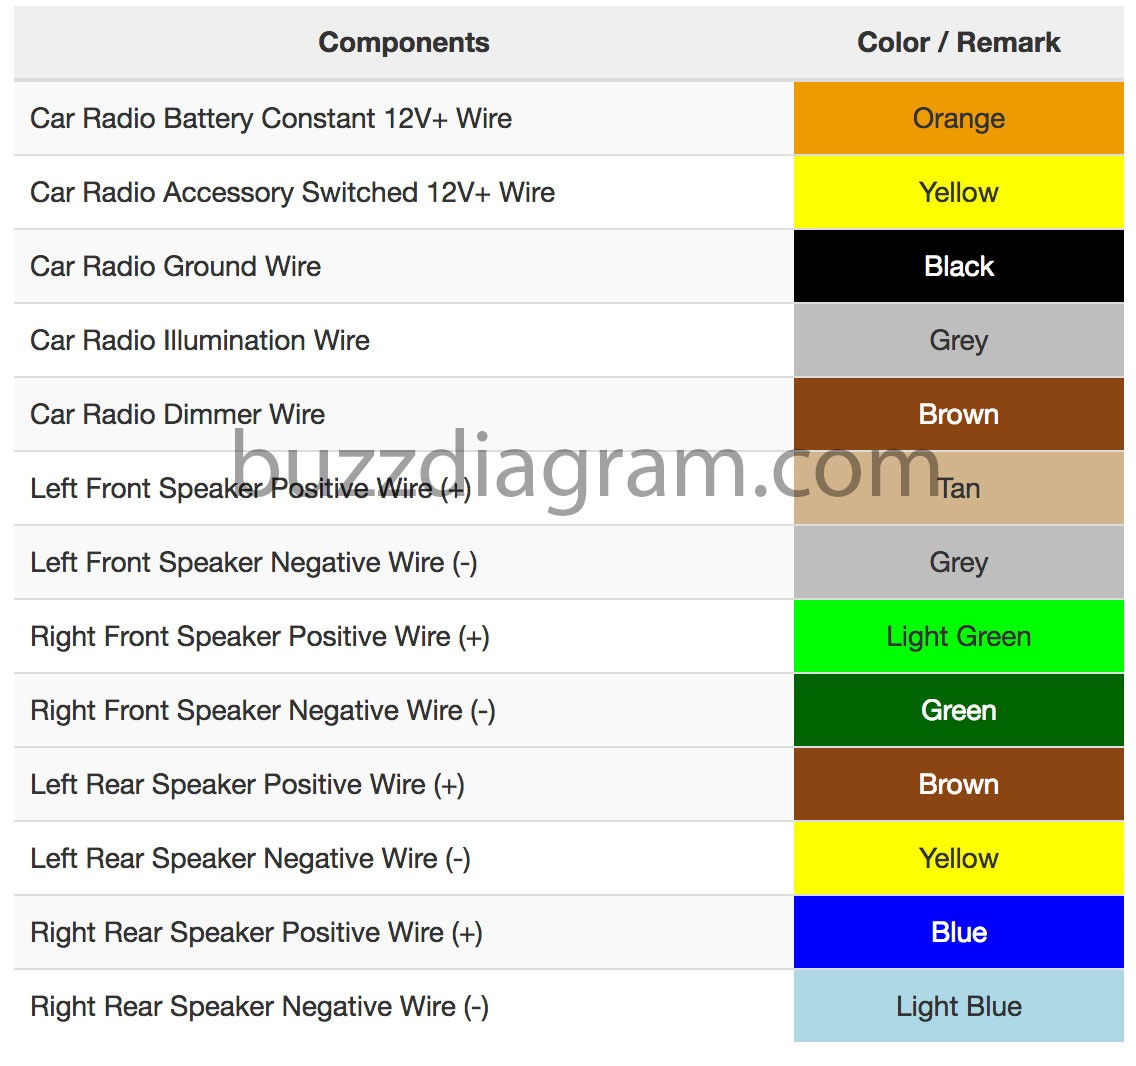 1997 buick lesabre radio wiring diagram complete wiring diagram 1997 buick lesabre radio wiring diagram